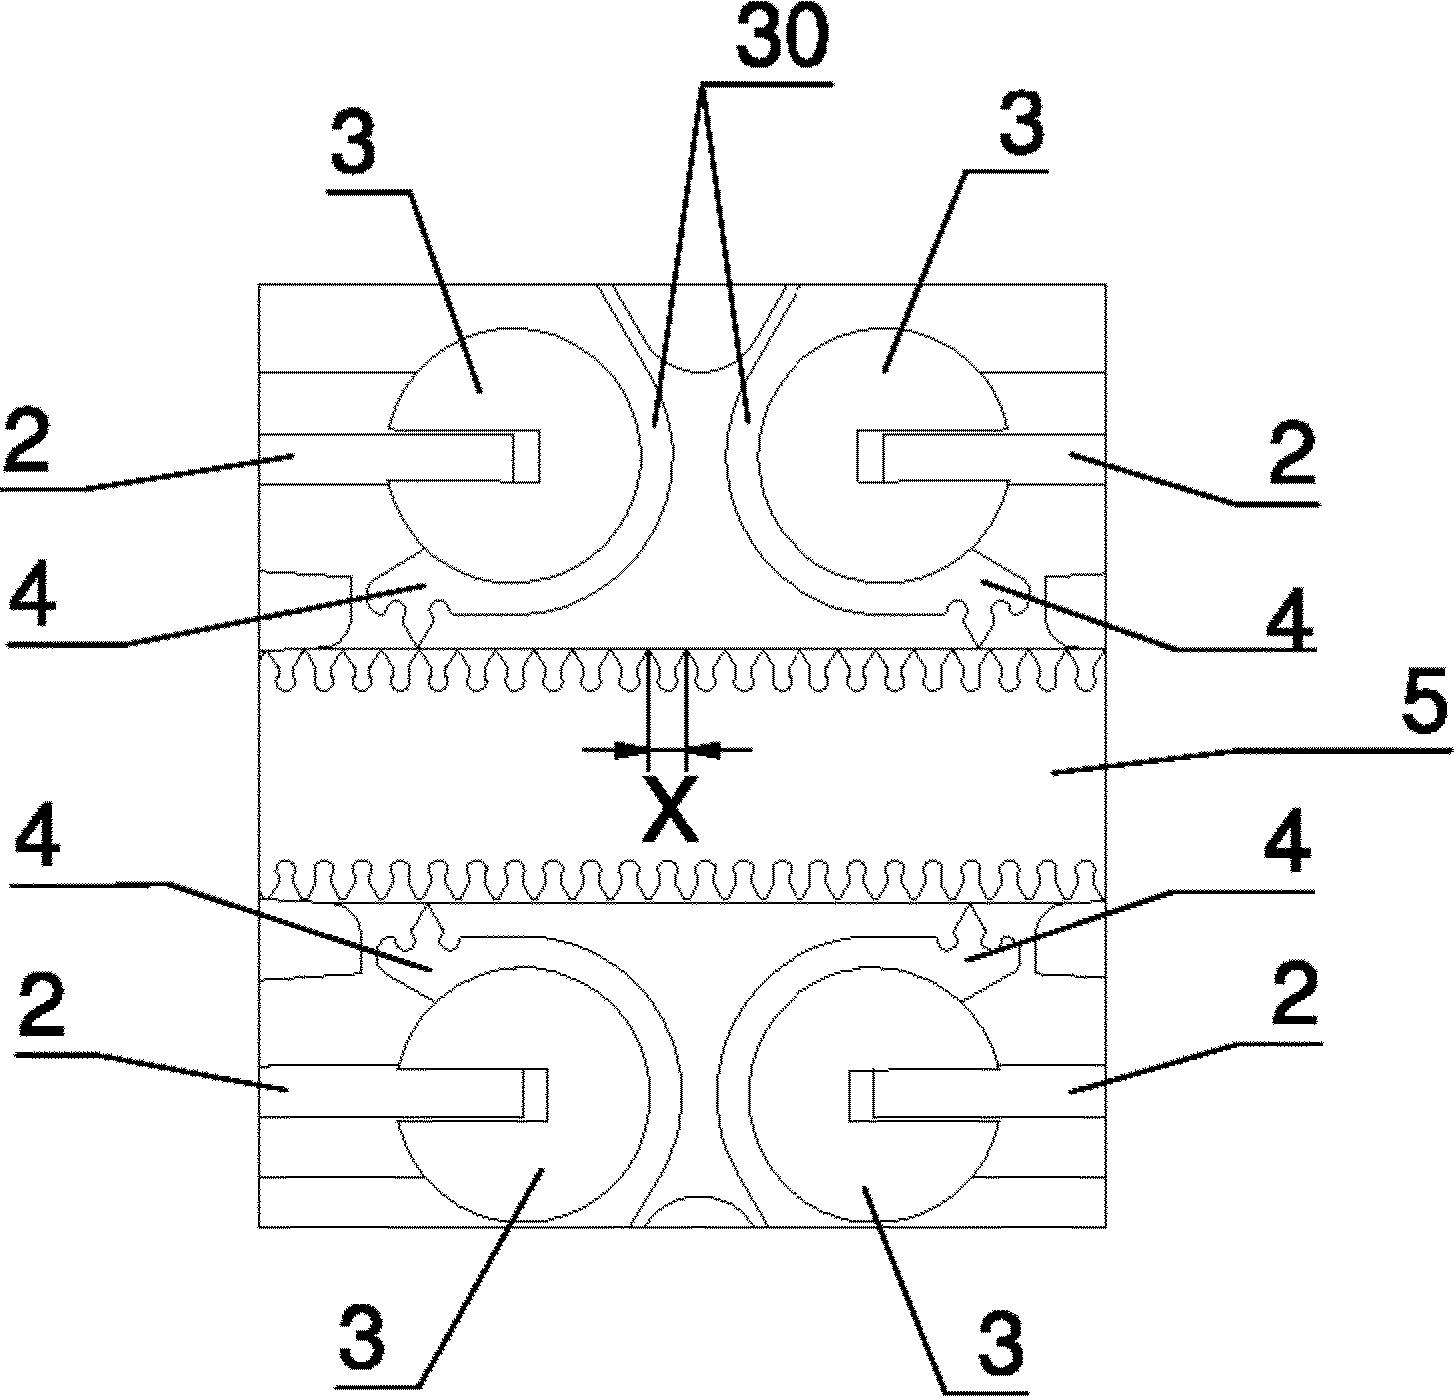 Figure GB2560326A_D0002